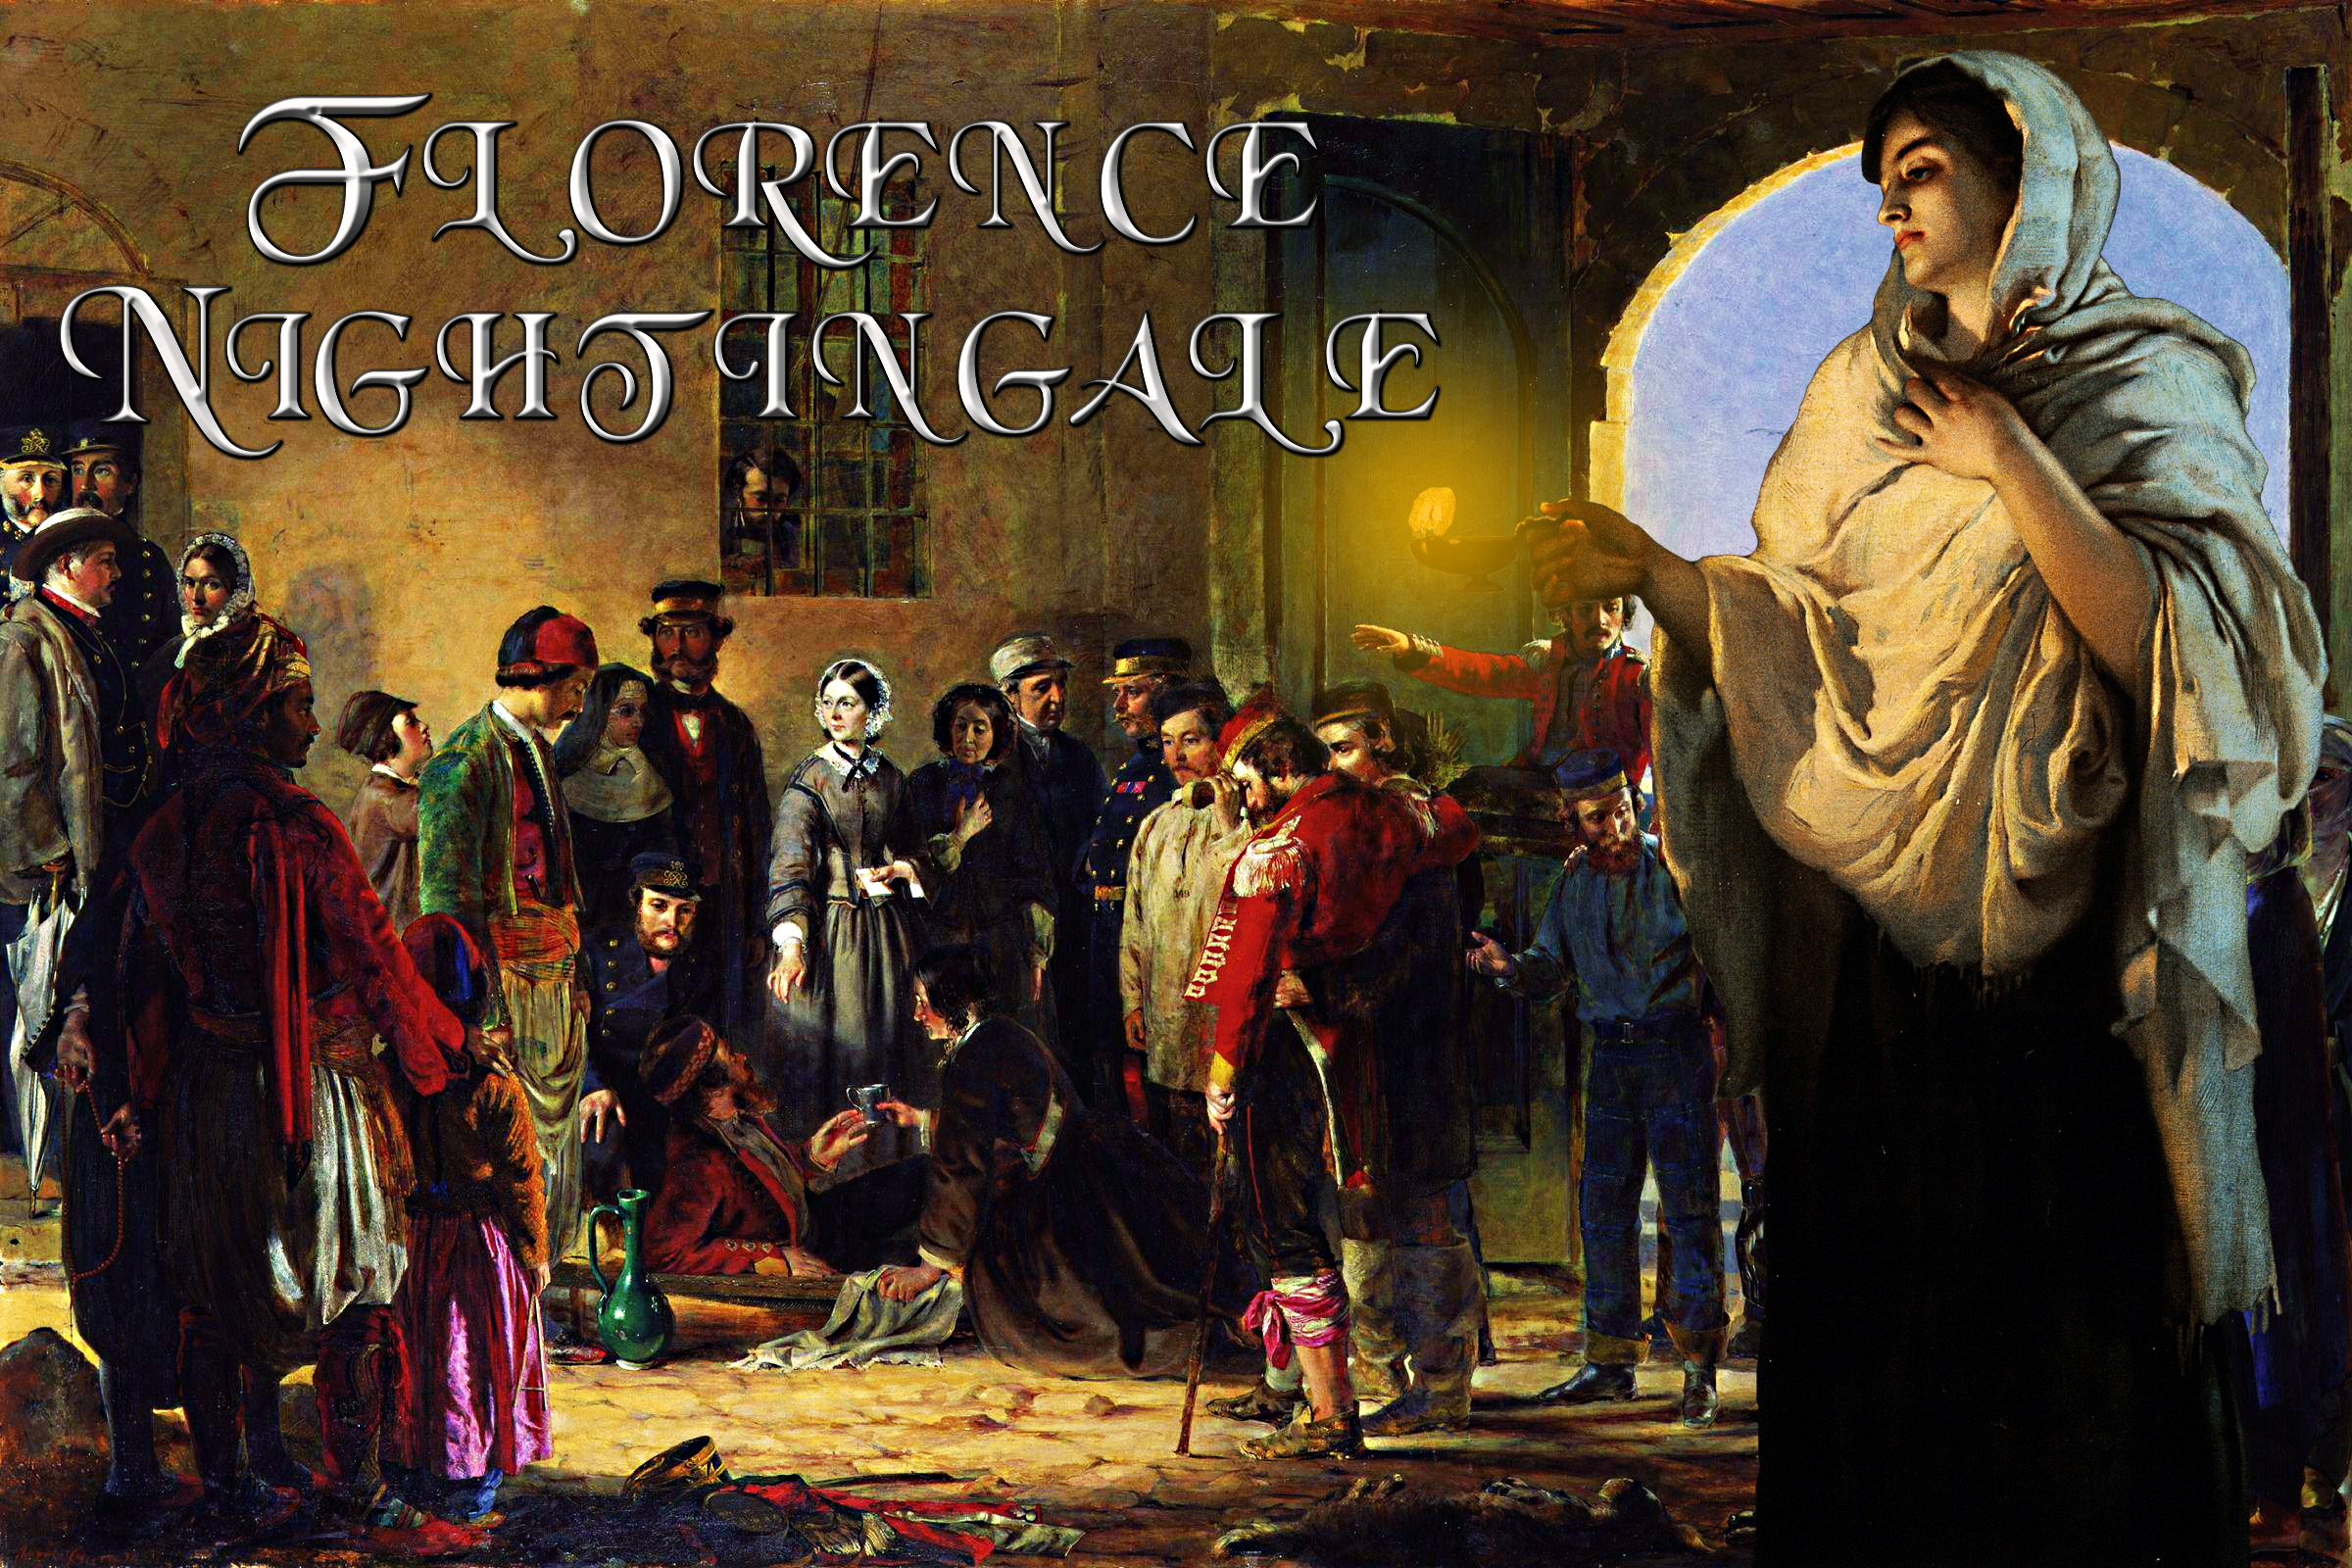 Florence Nightingale DnD 5e BANNER.jpg